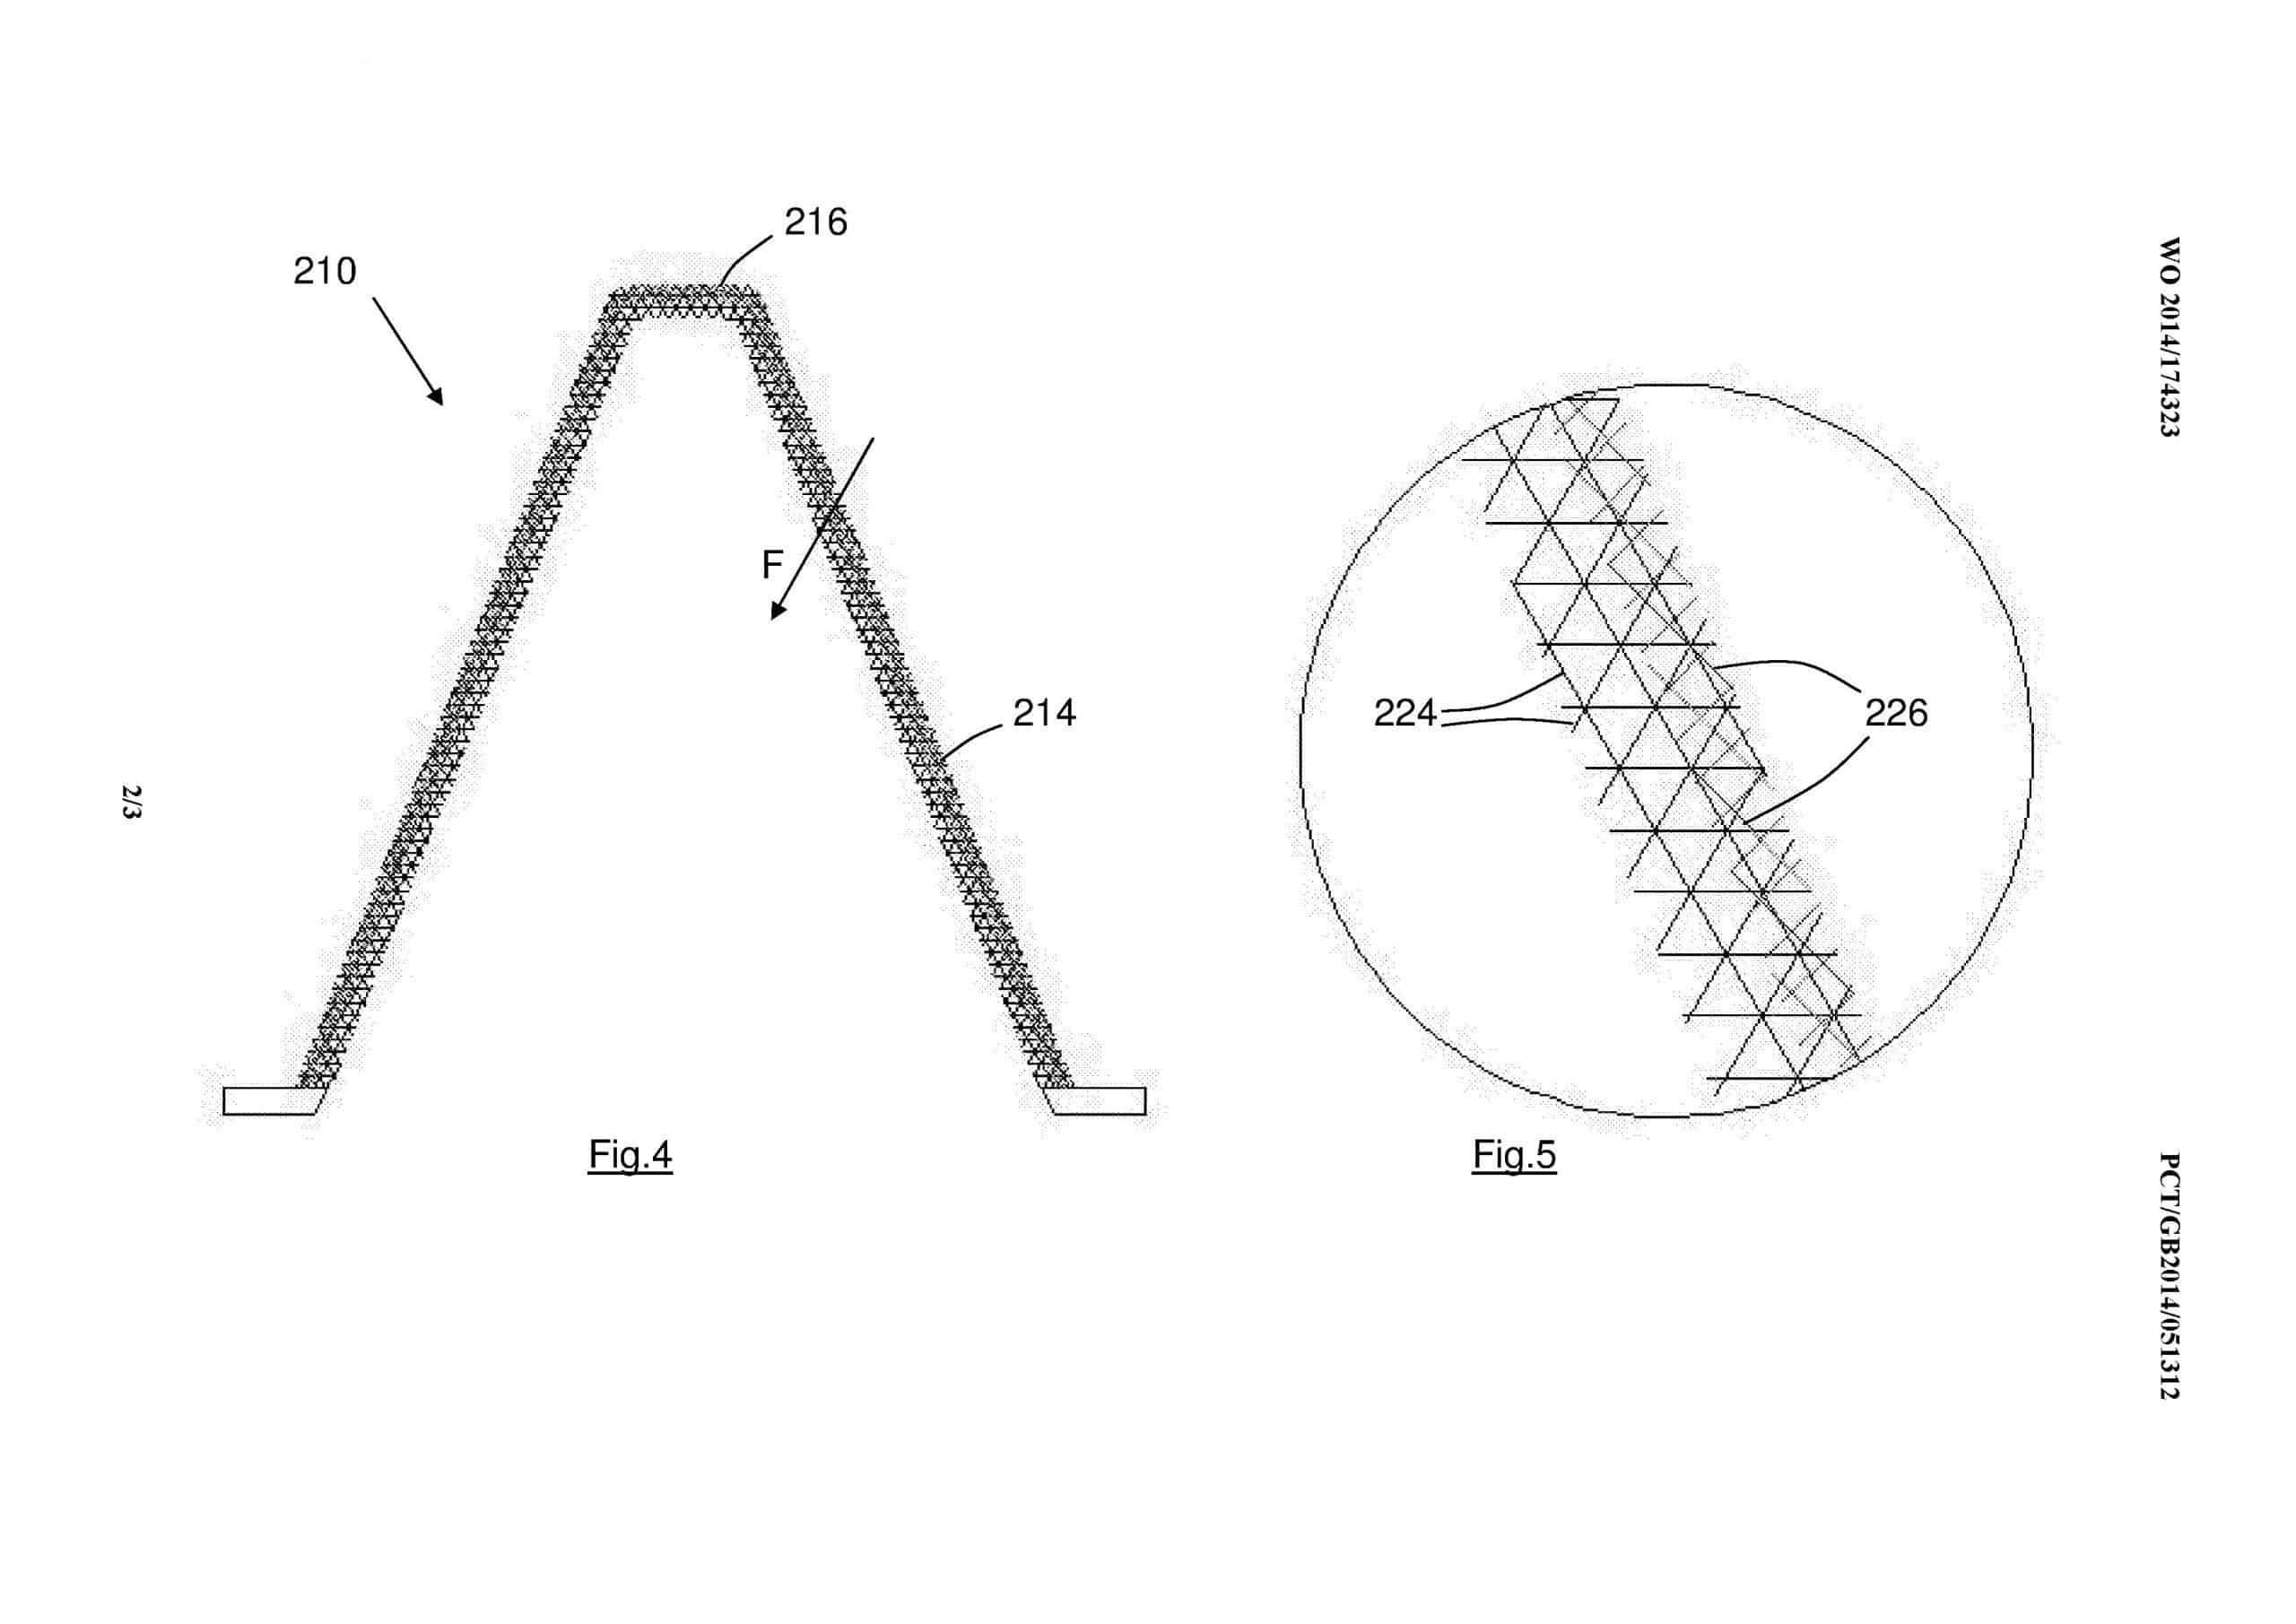 Croft-Filters-Patent-Image-2